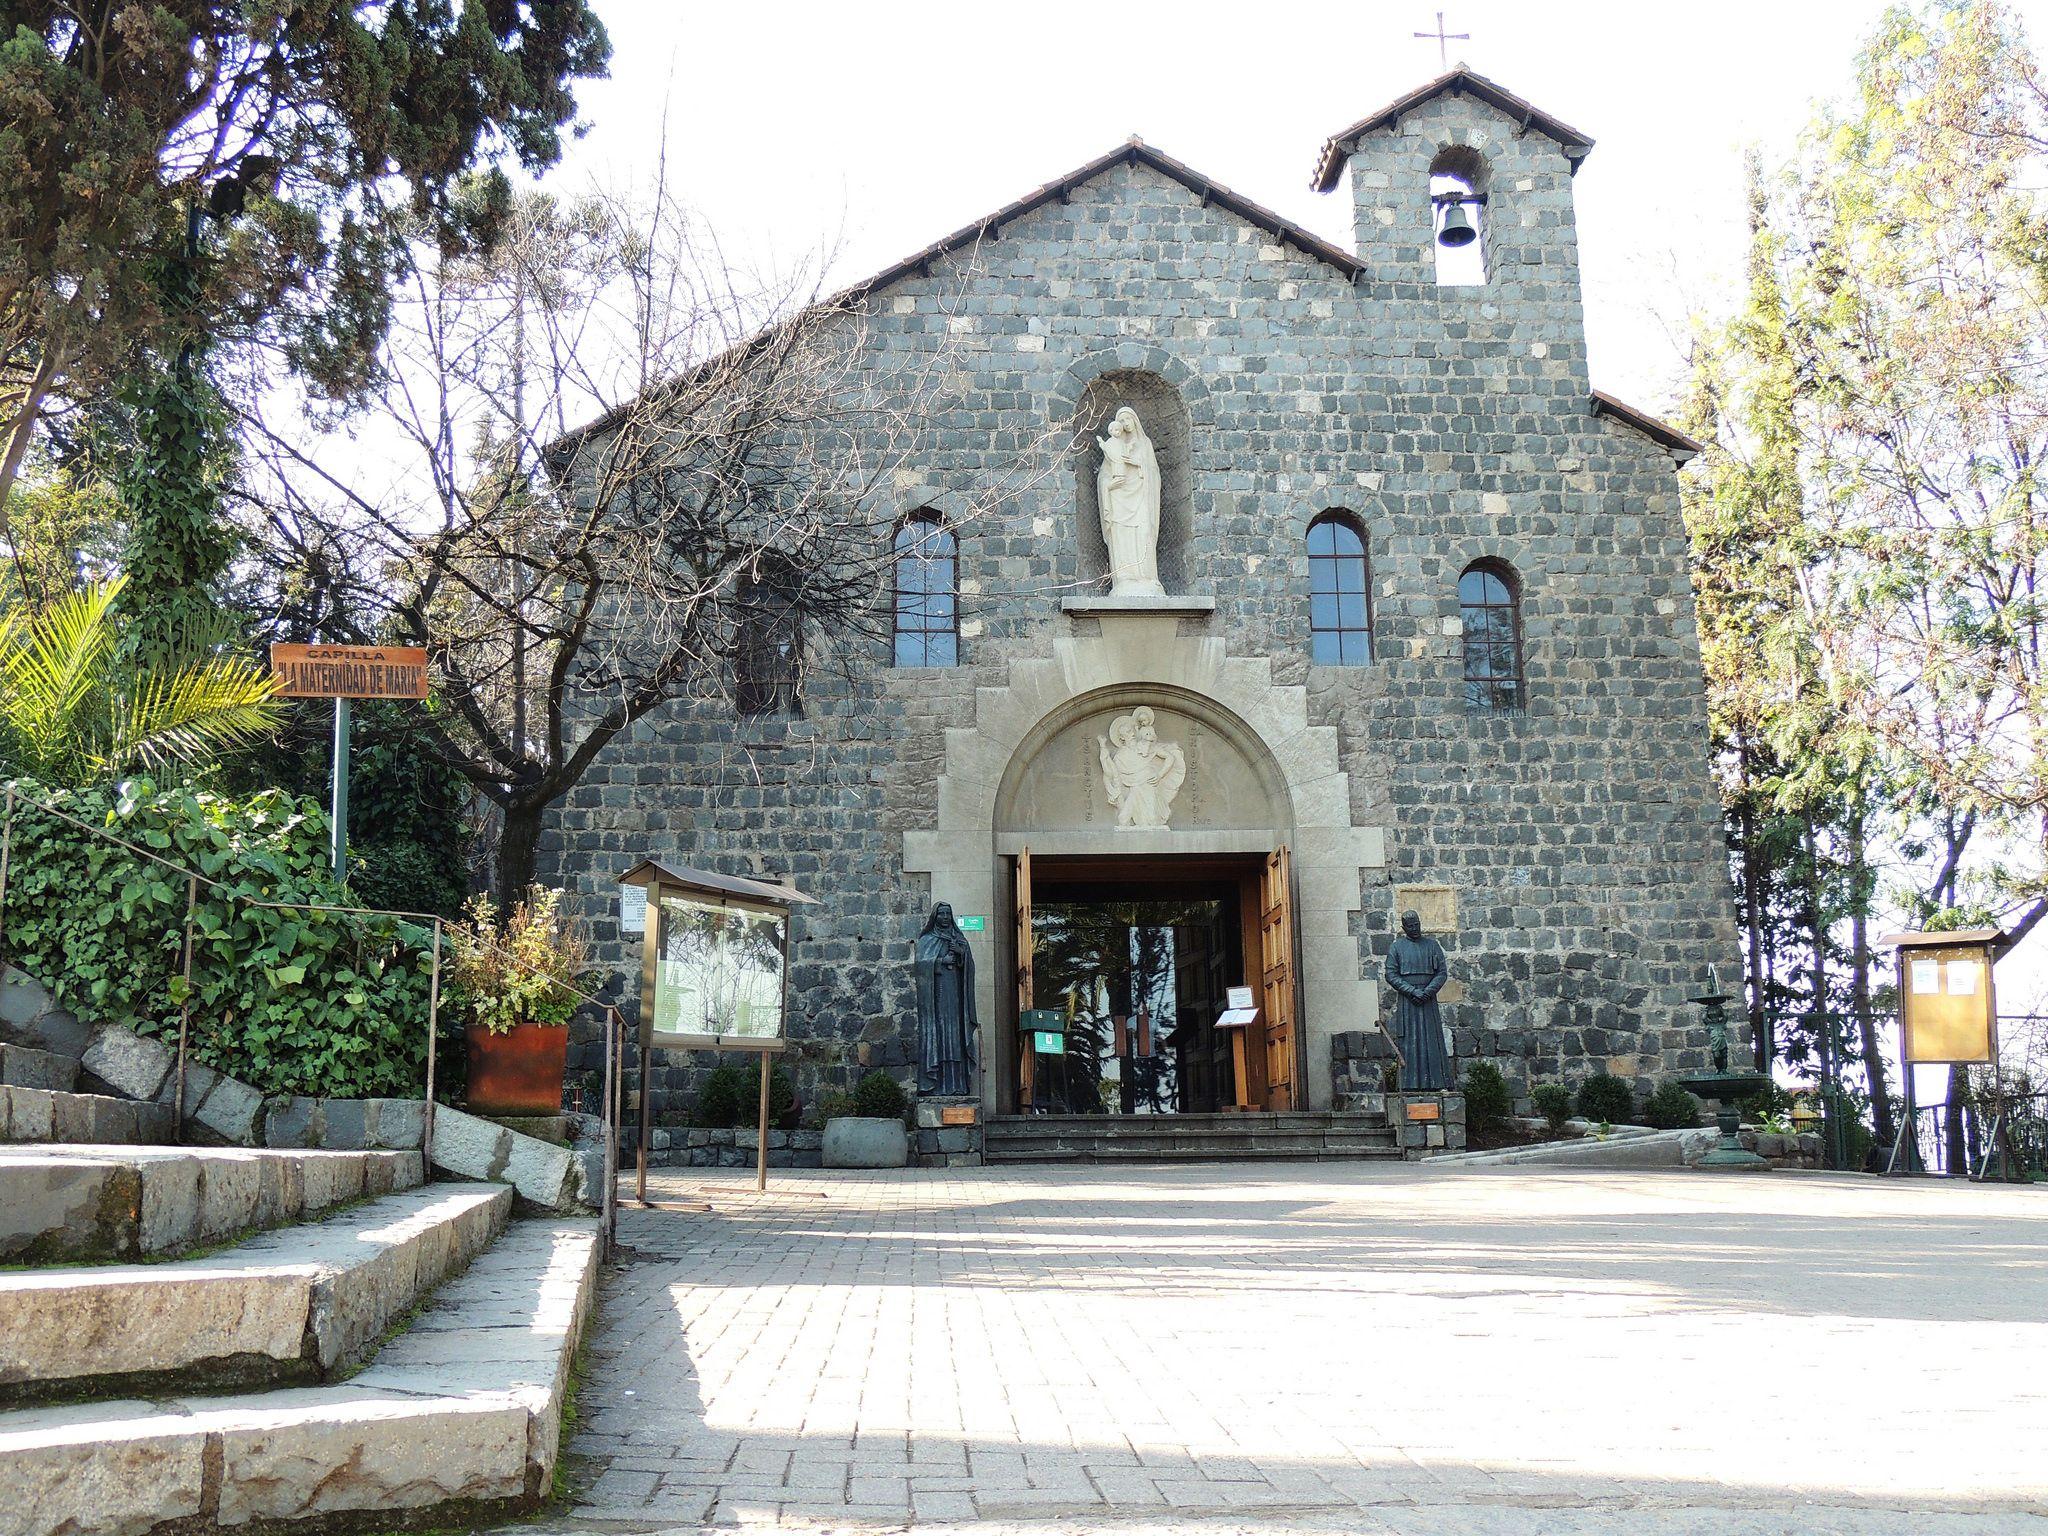 https://flic.kr/p/wJB43V | Cerro San Cristóbal, Santiago de Chile - Agosto 2015 | Santiago de Chile